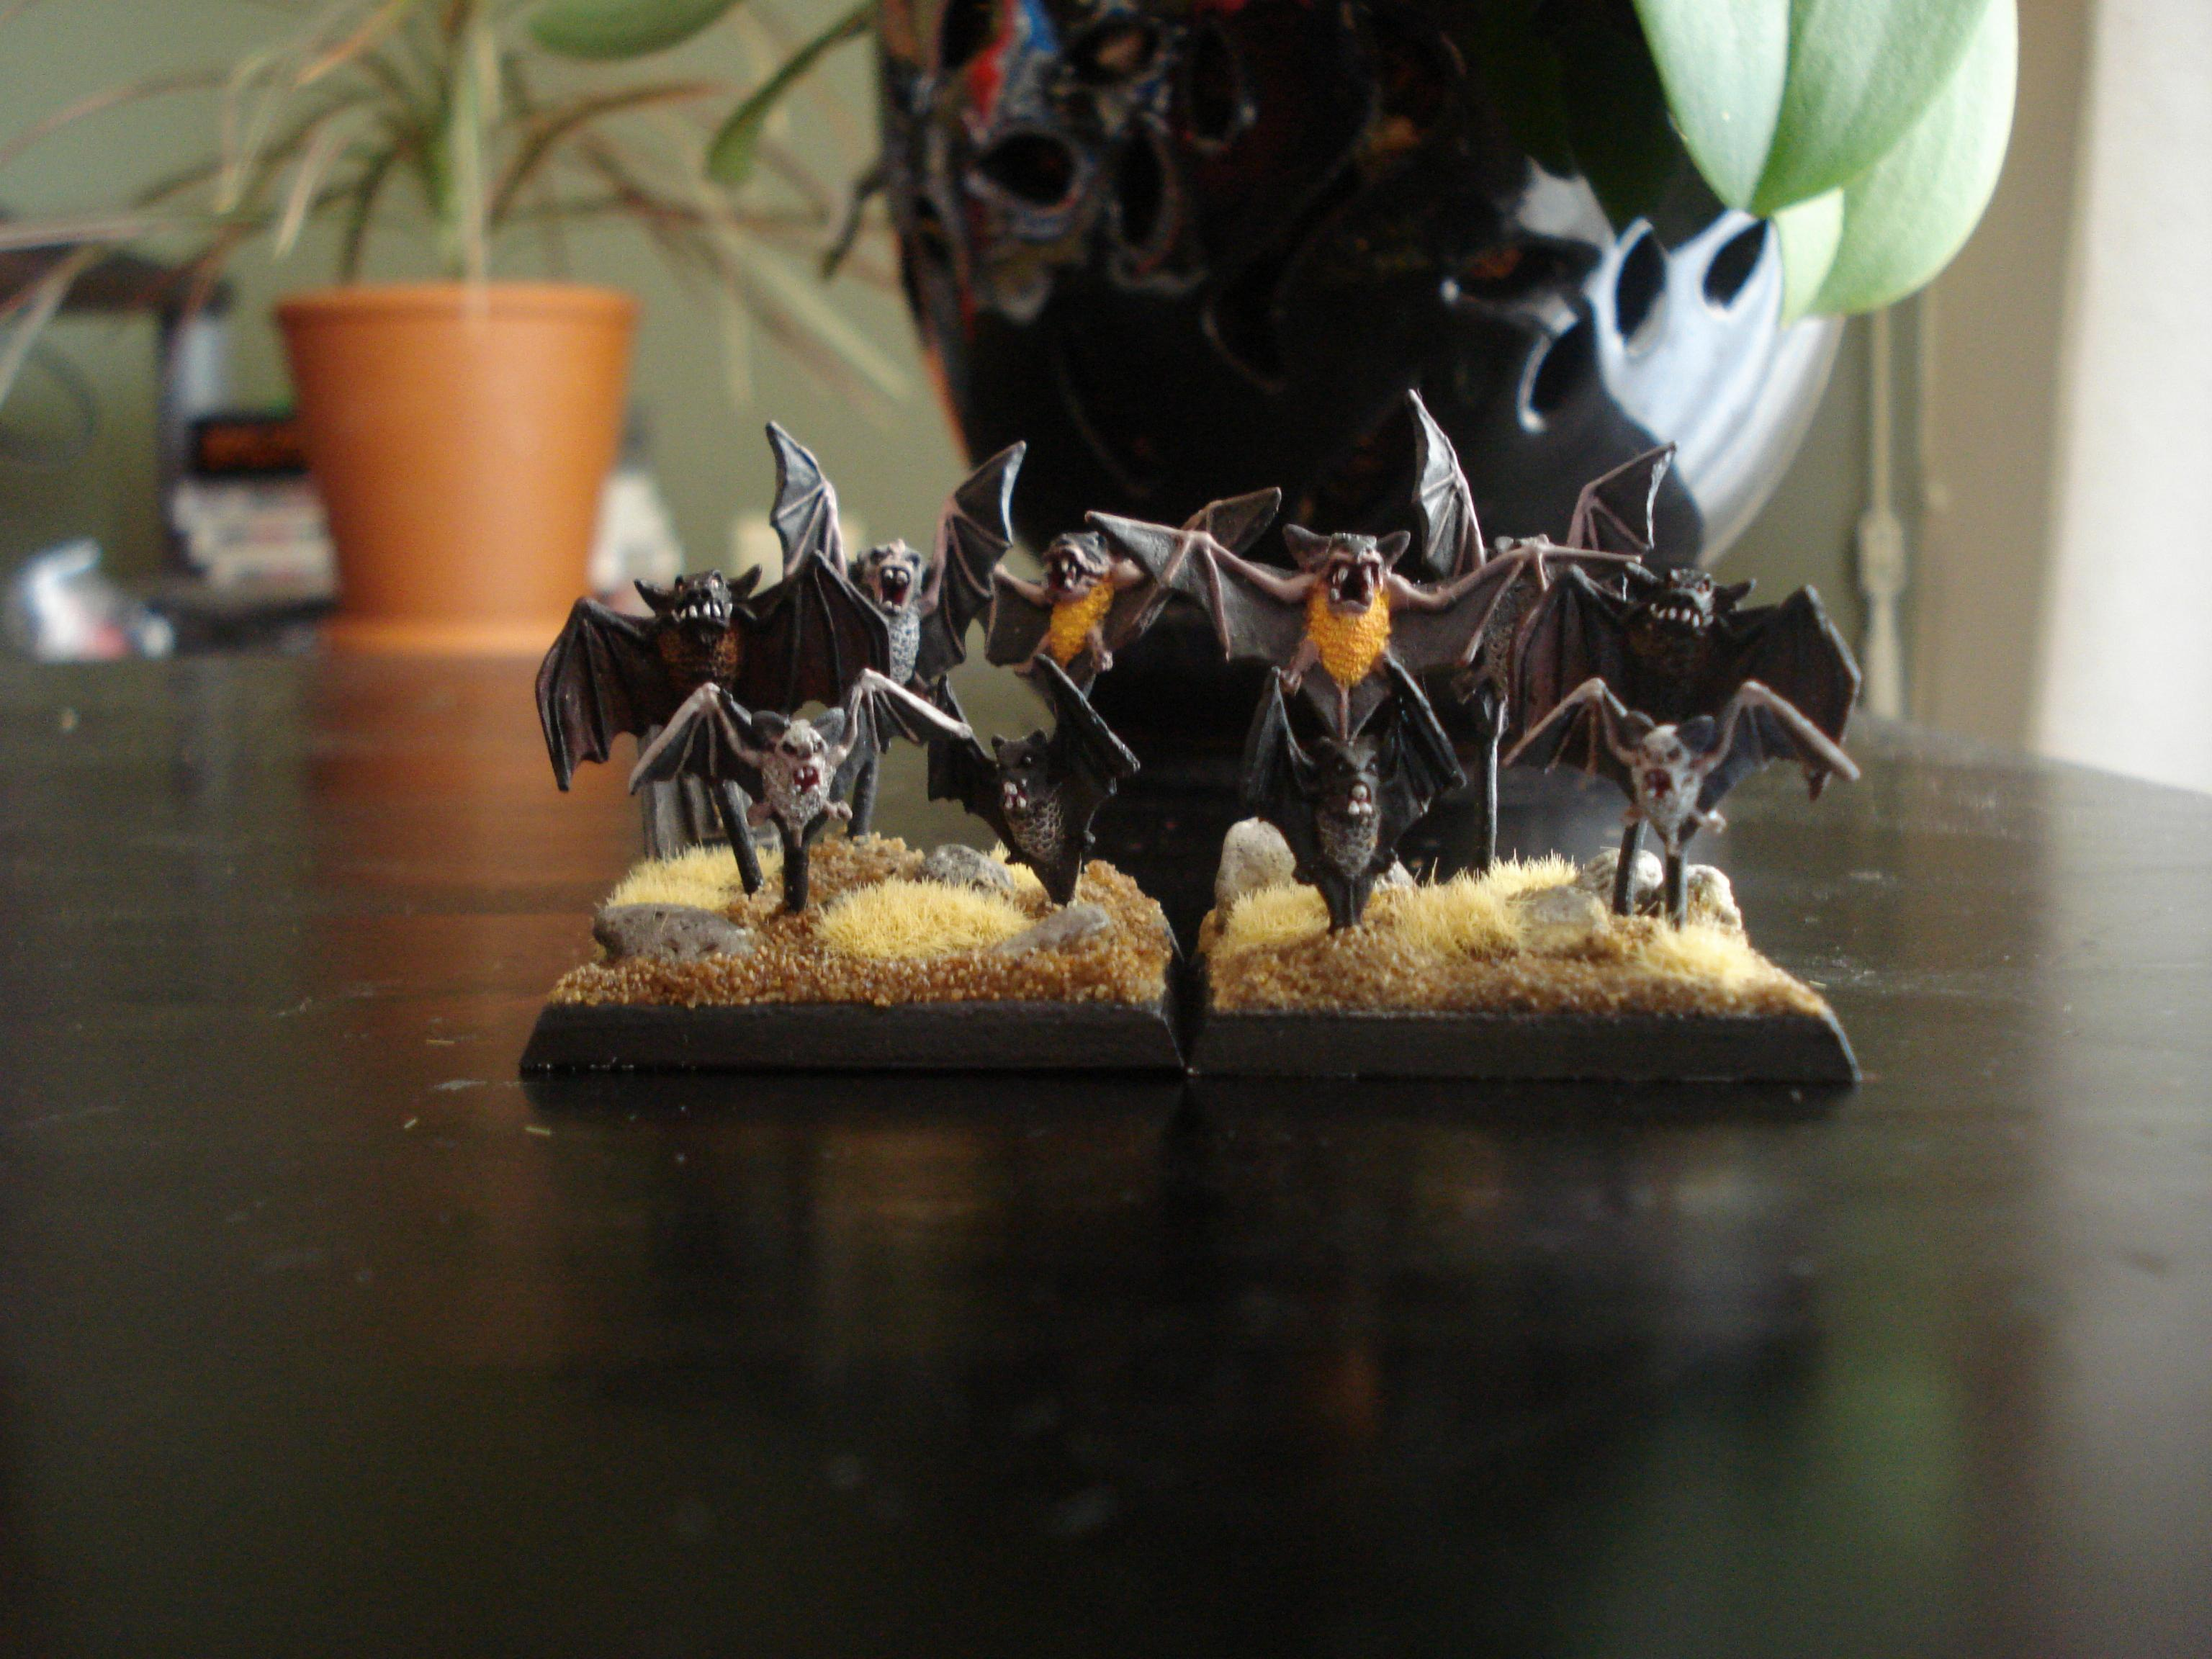 Bat Swarm, Bat Swarms, Bats, Vampire Counts, Warhammer Fantasy